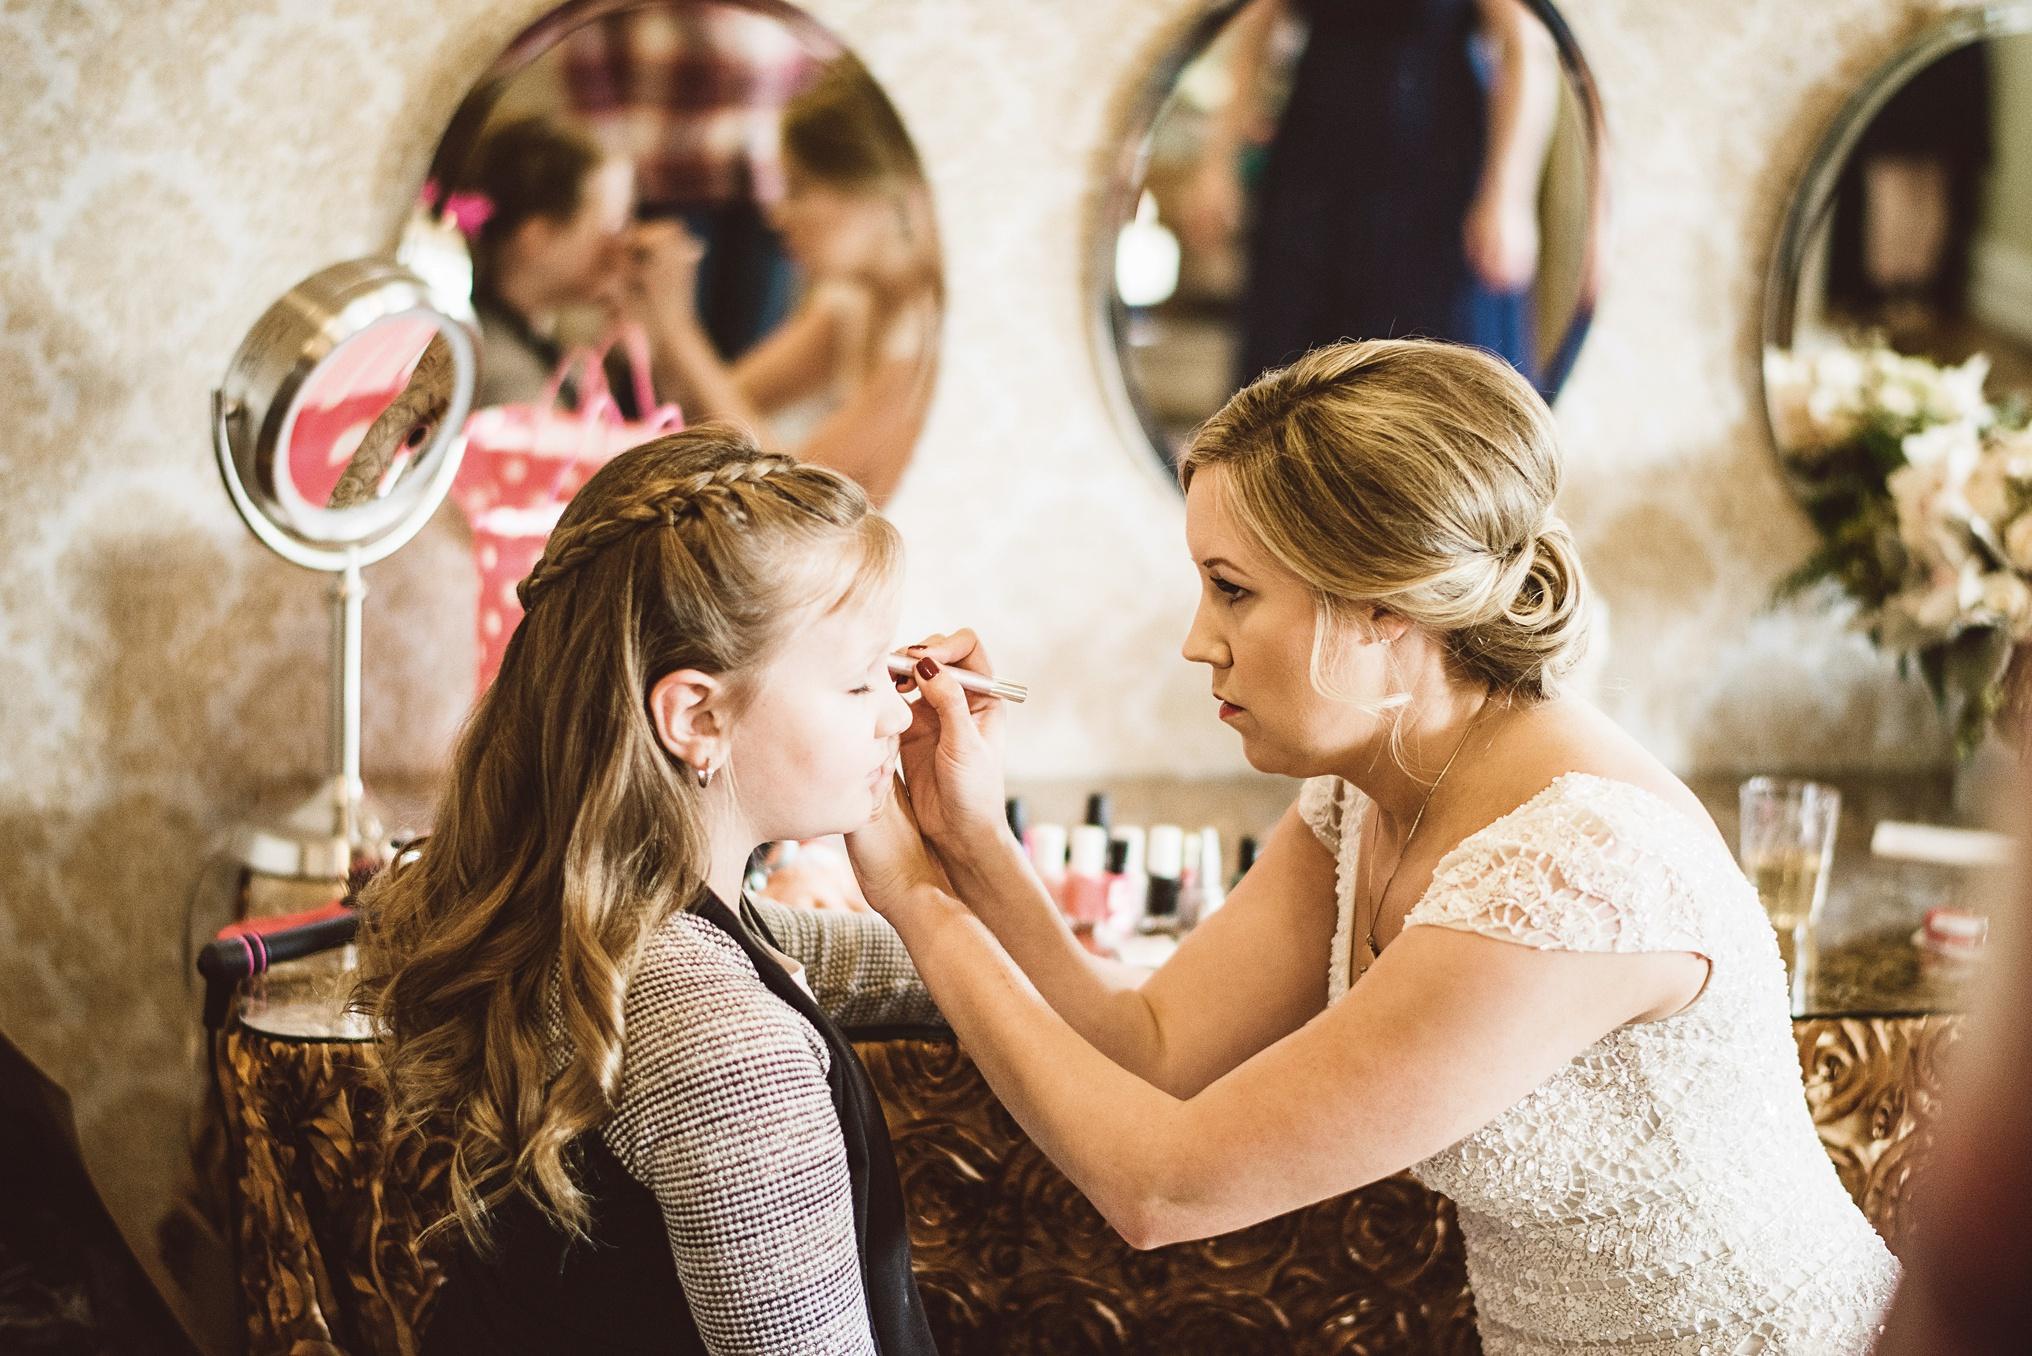 best_wedding_photography_2017_by_lucas_botz_photography_078.jpg